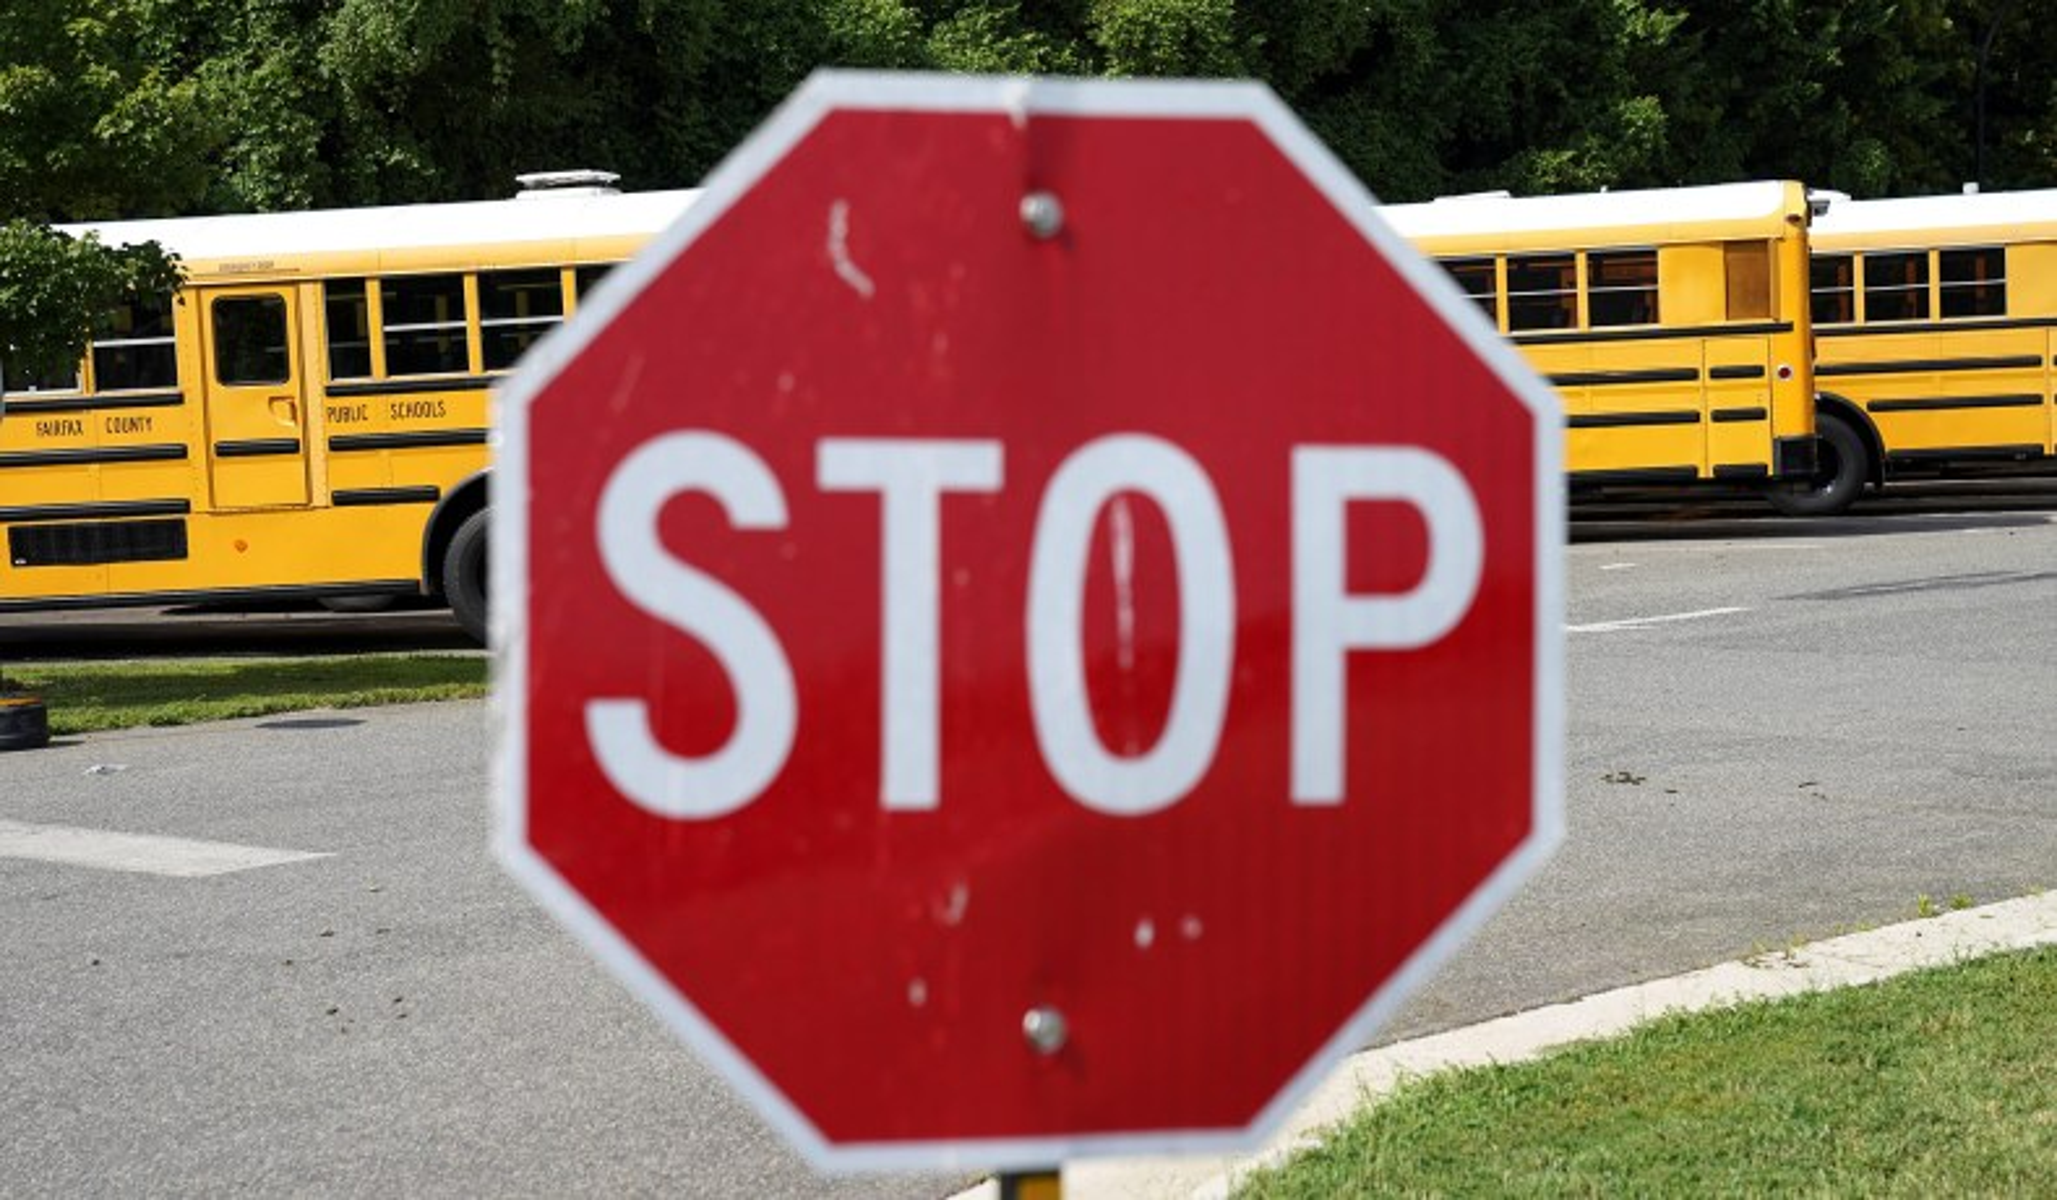 fairfax county bus stop sign